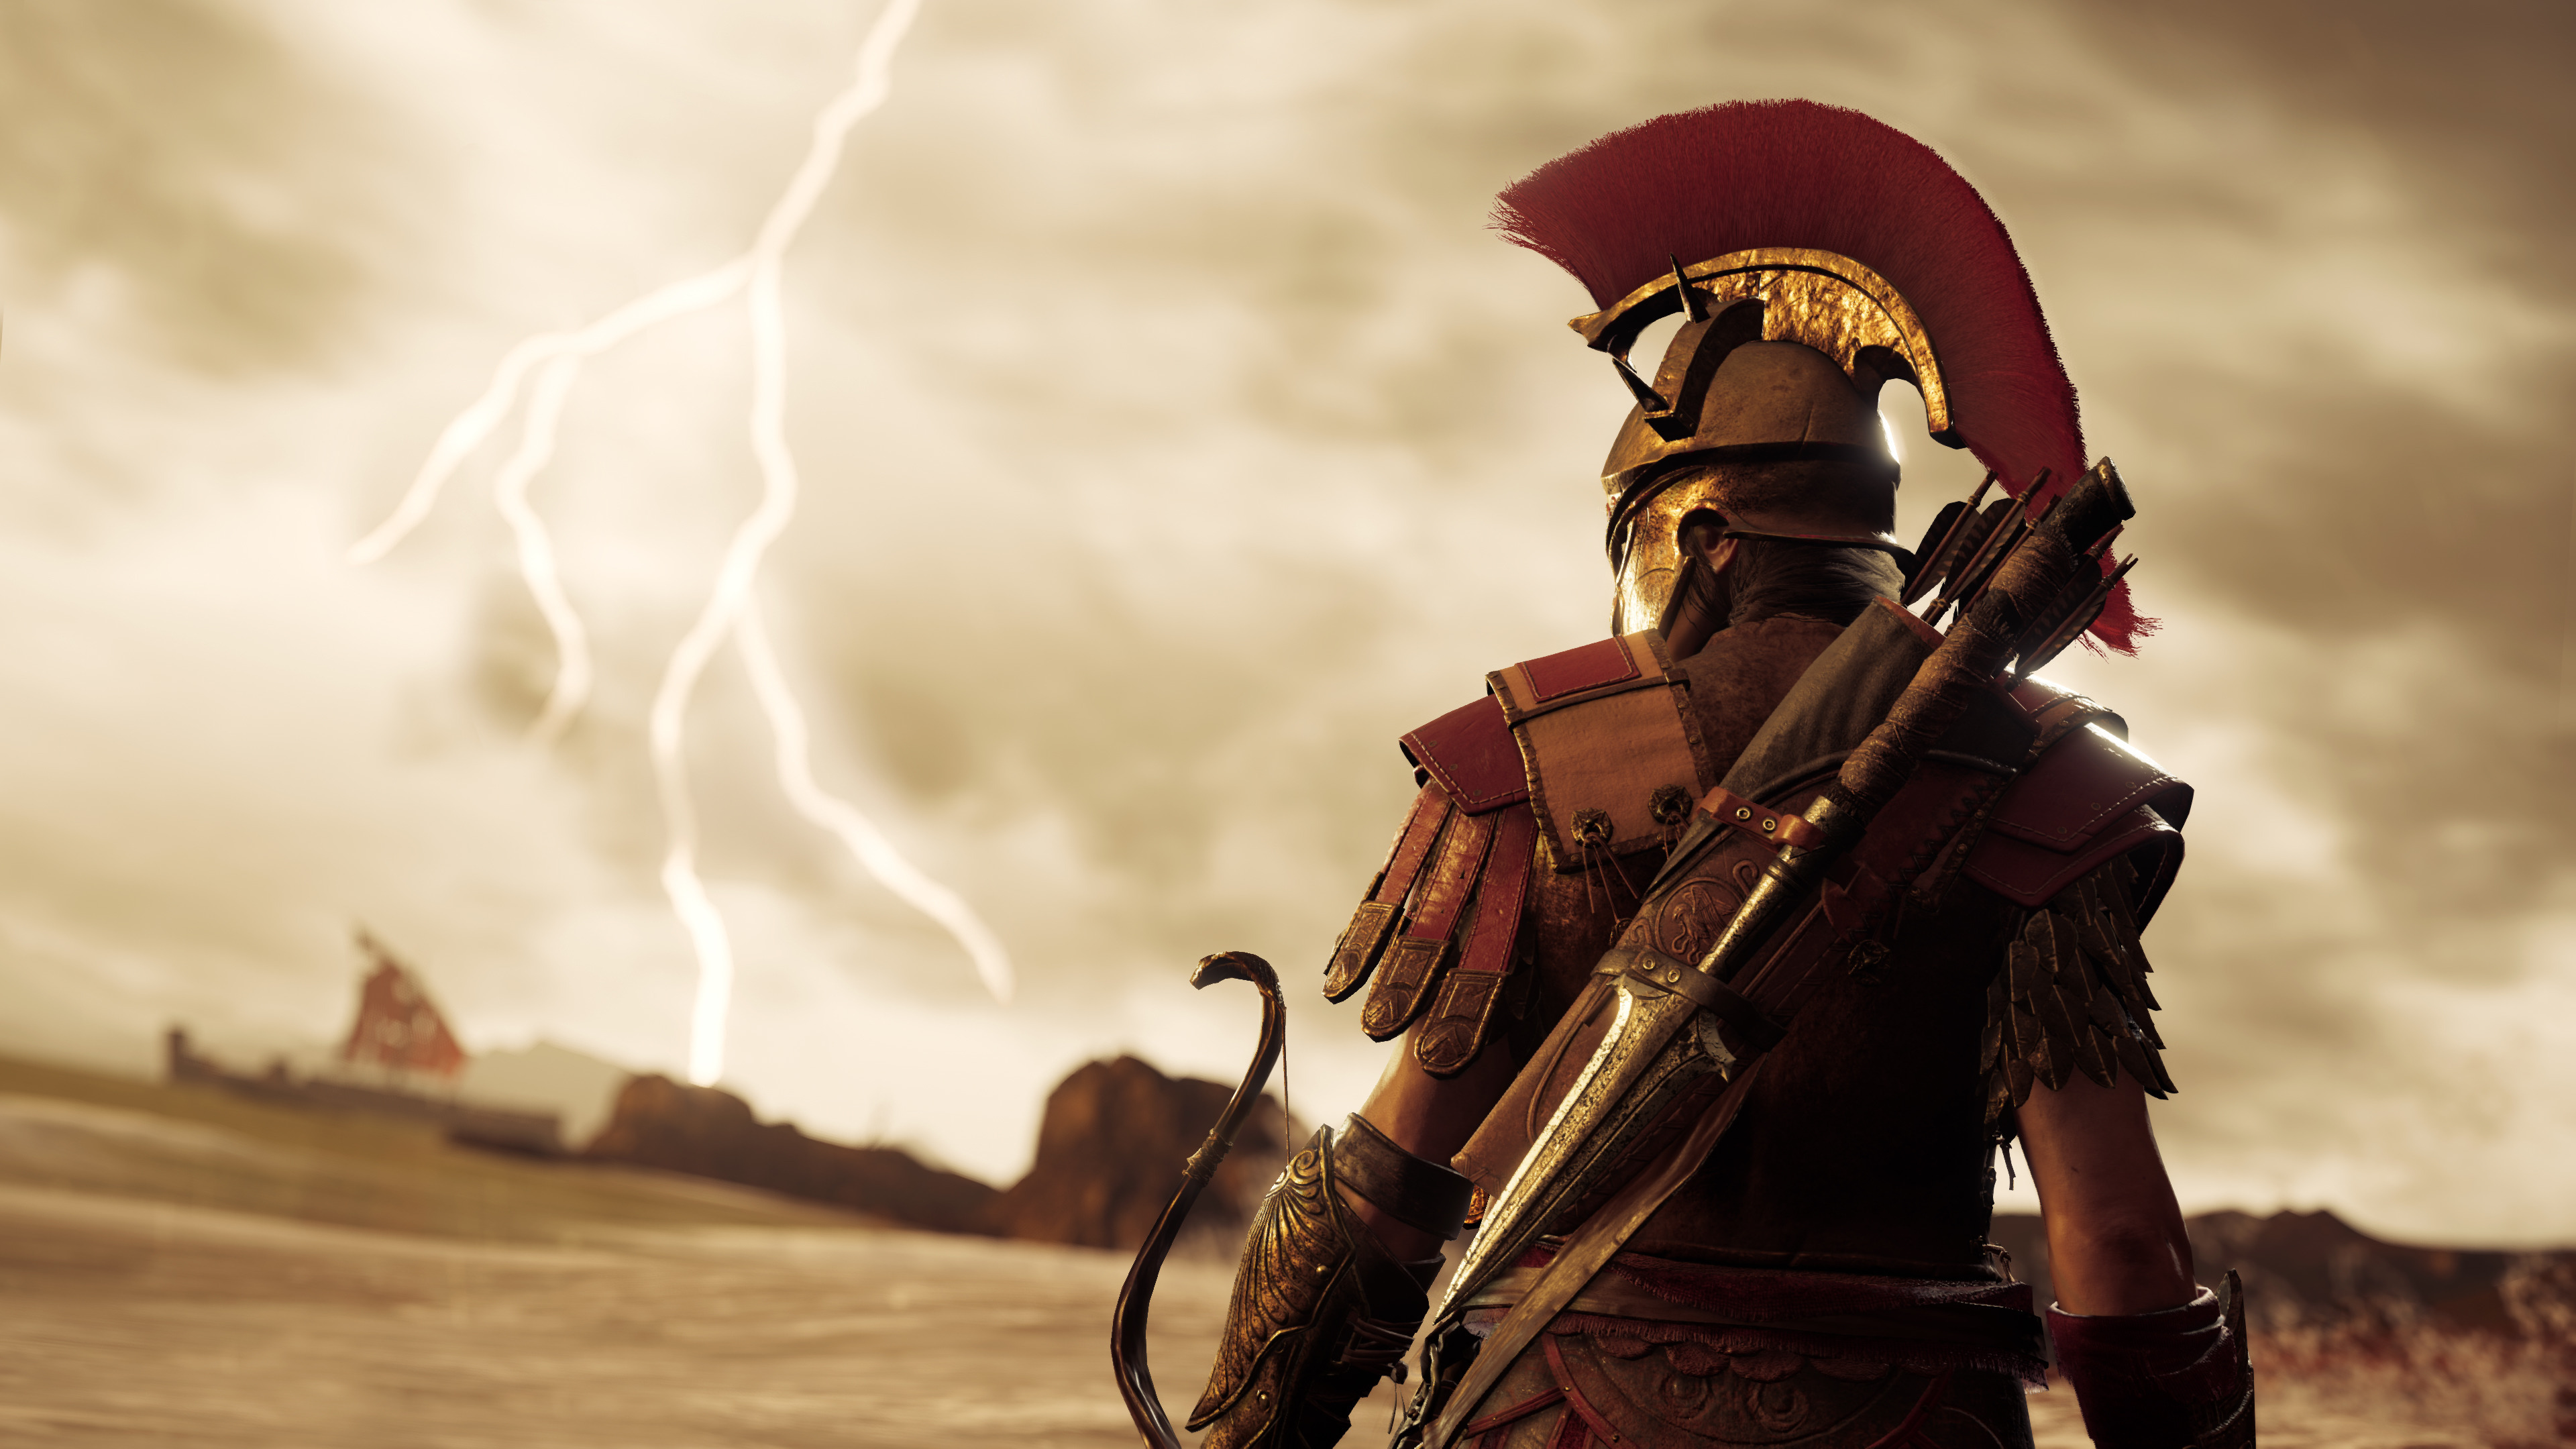 3840x2160 2018 Assassins Creed Odyssey Video Game 4k Hd 4k